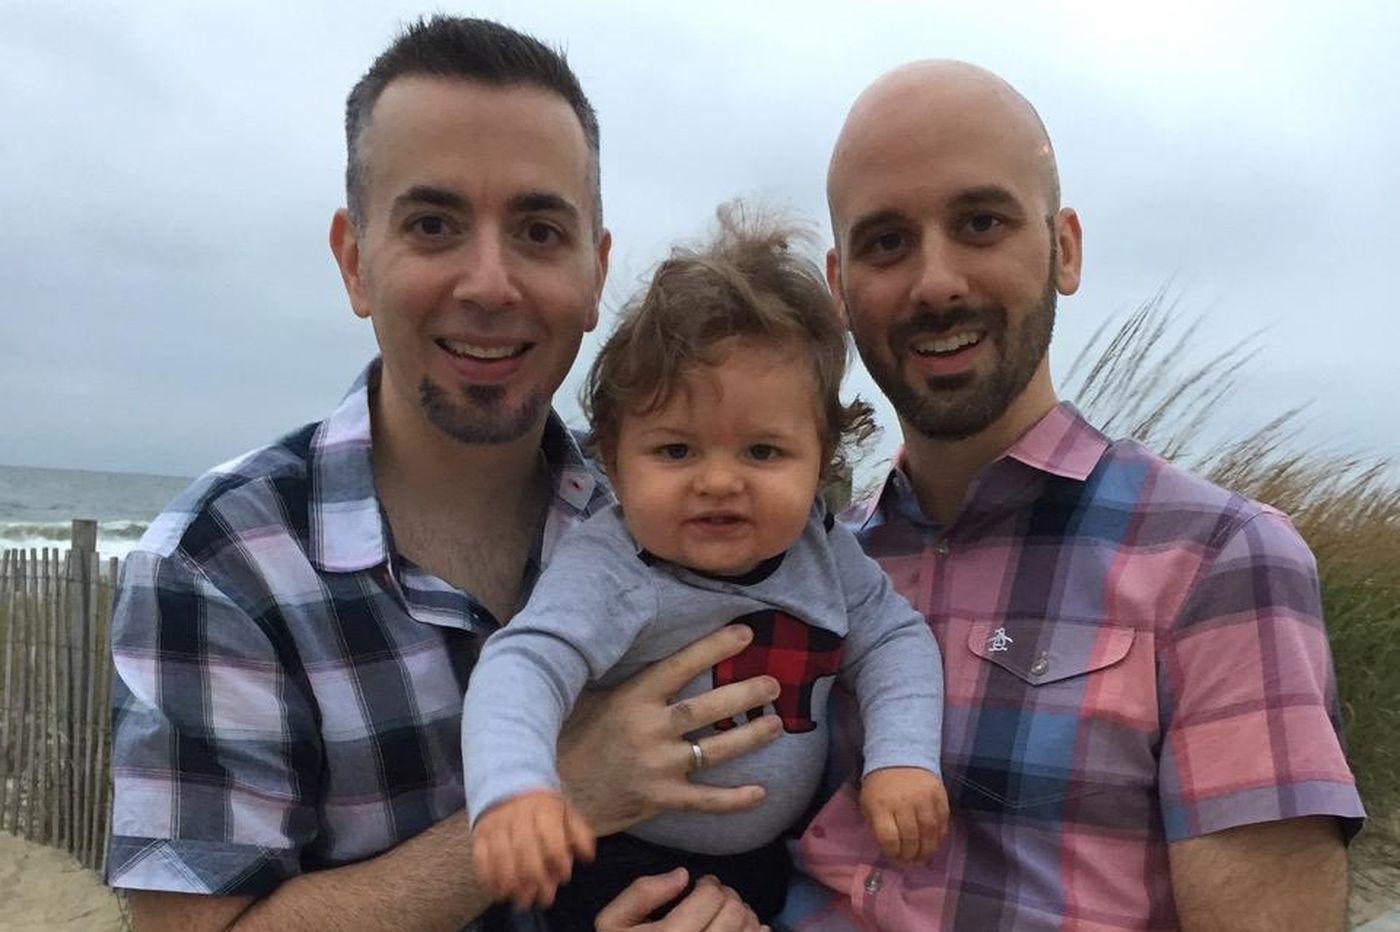 The Parent Trip: Brian Collins and Fred Cusick Jr. of Passyunk Square